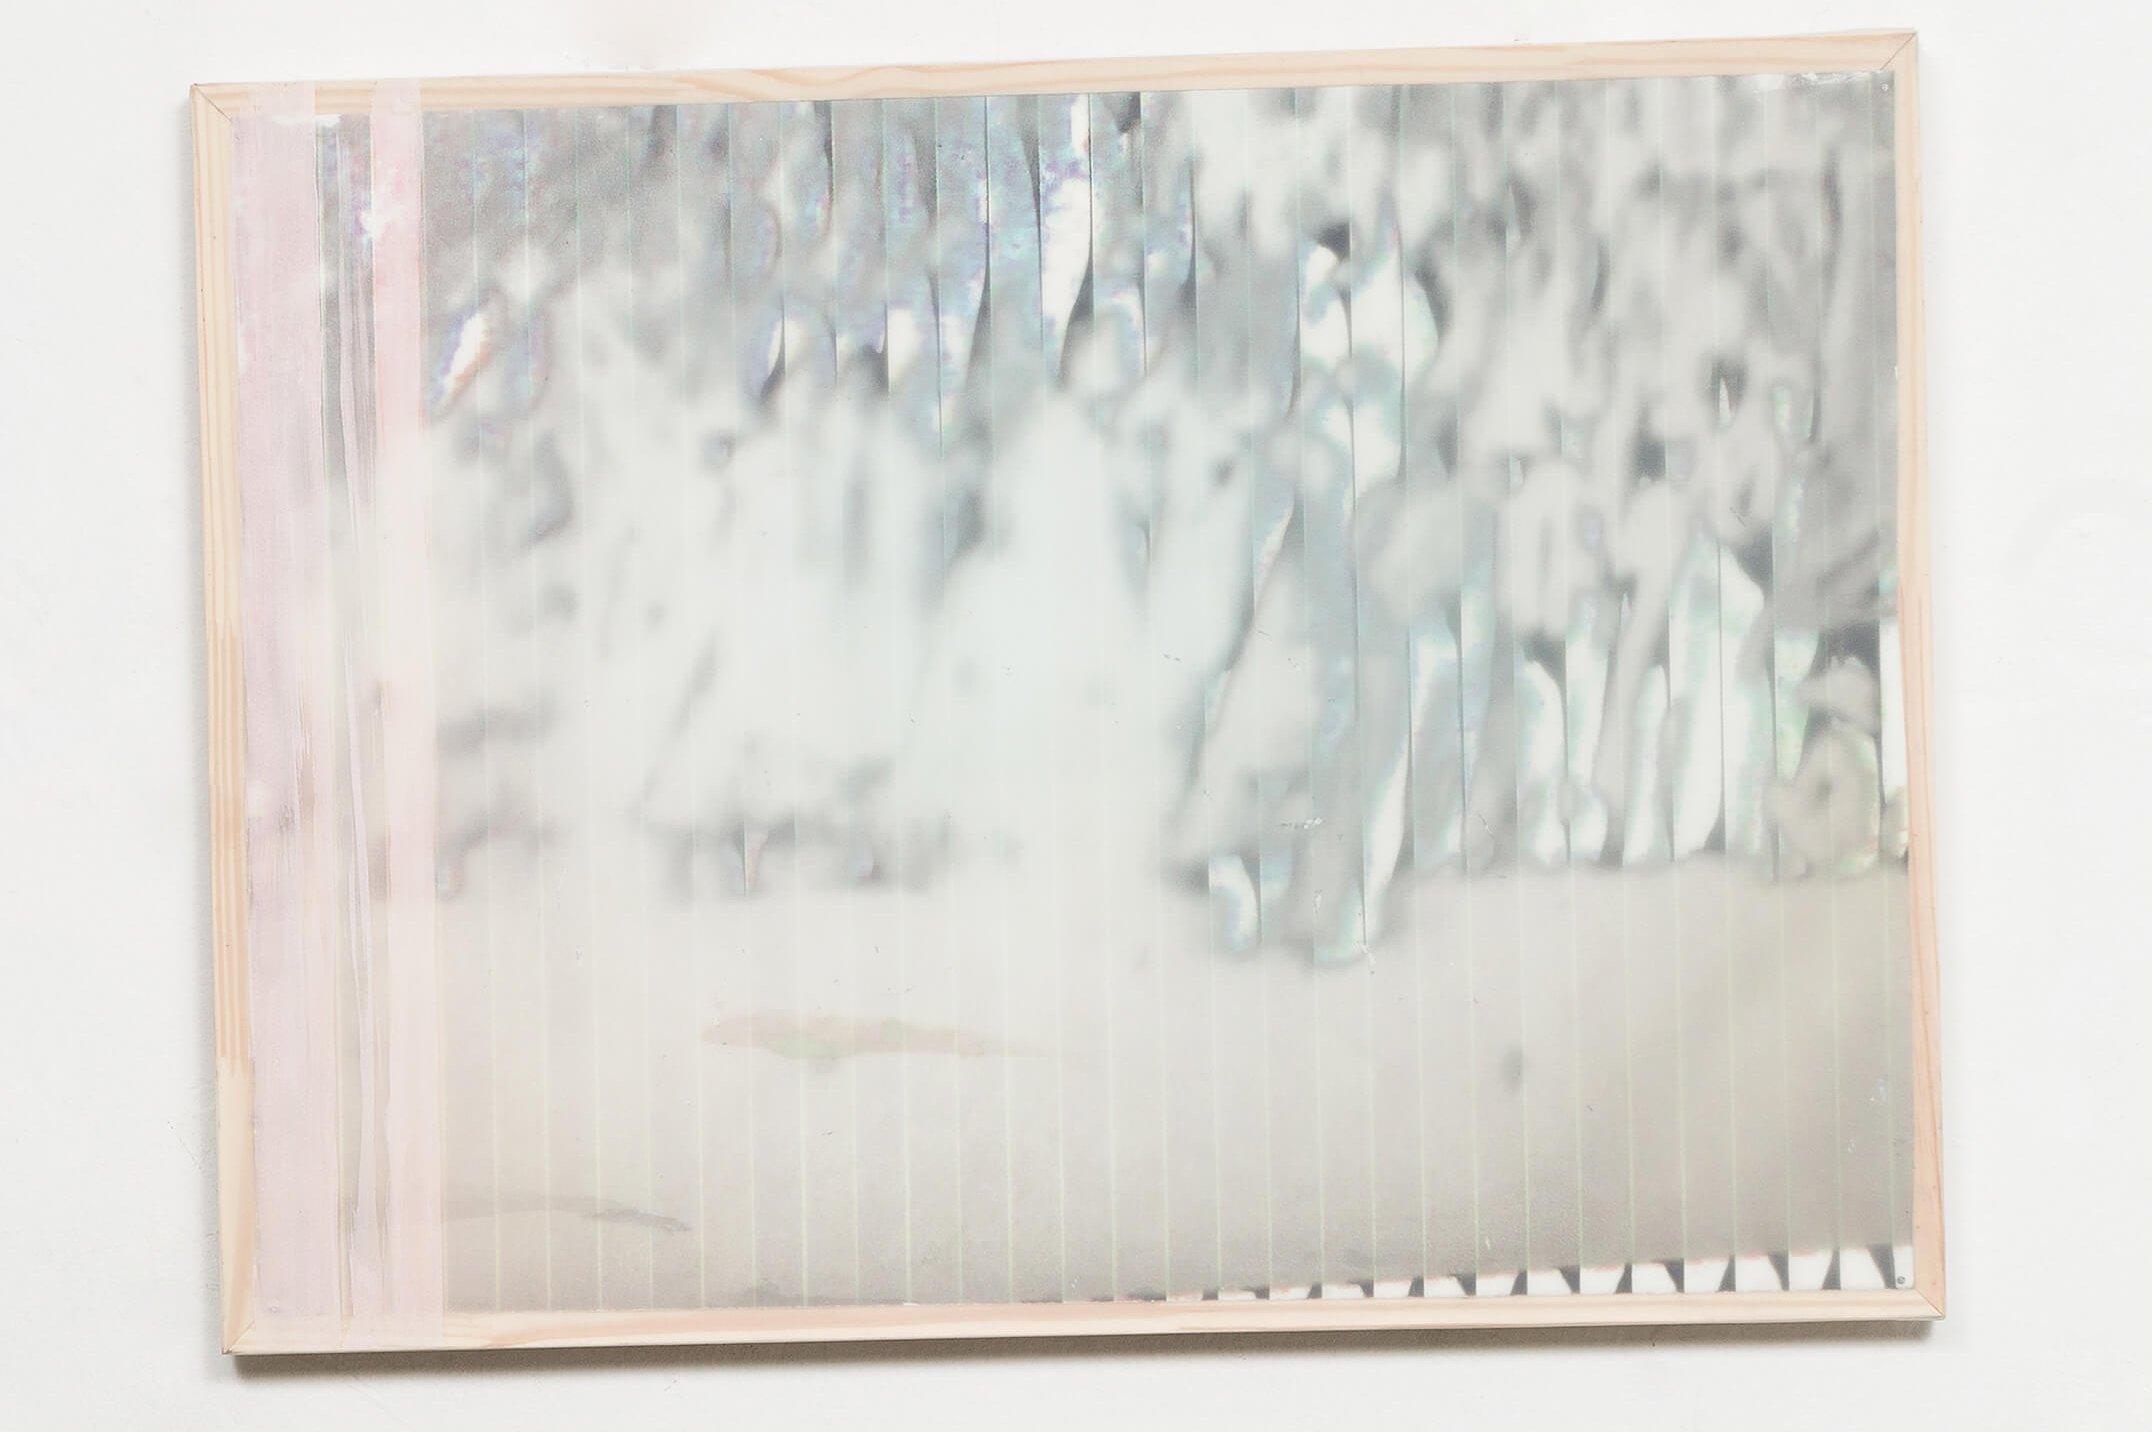 Marina Perez Simão,<em>untitled</em>, 2013,print on paper, polyester and reflector pigment, 44,5 × 60 cm - Mendes Wood DM